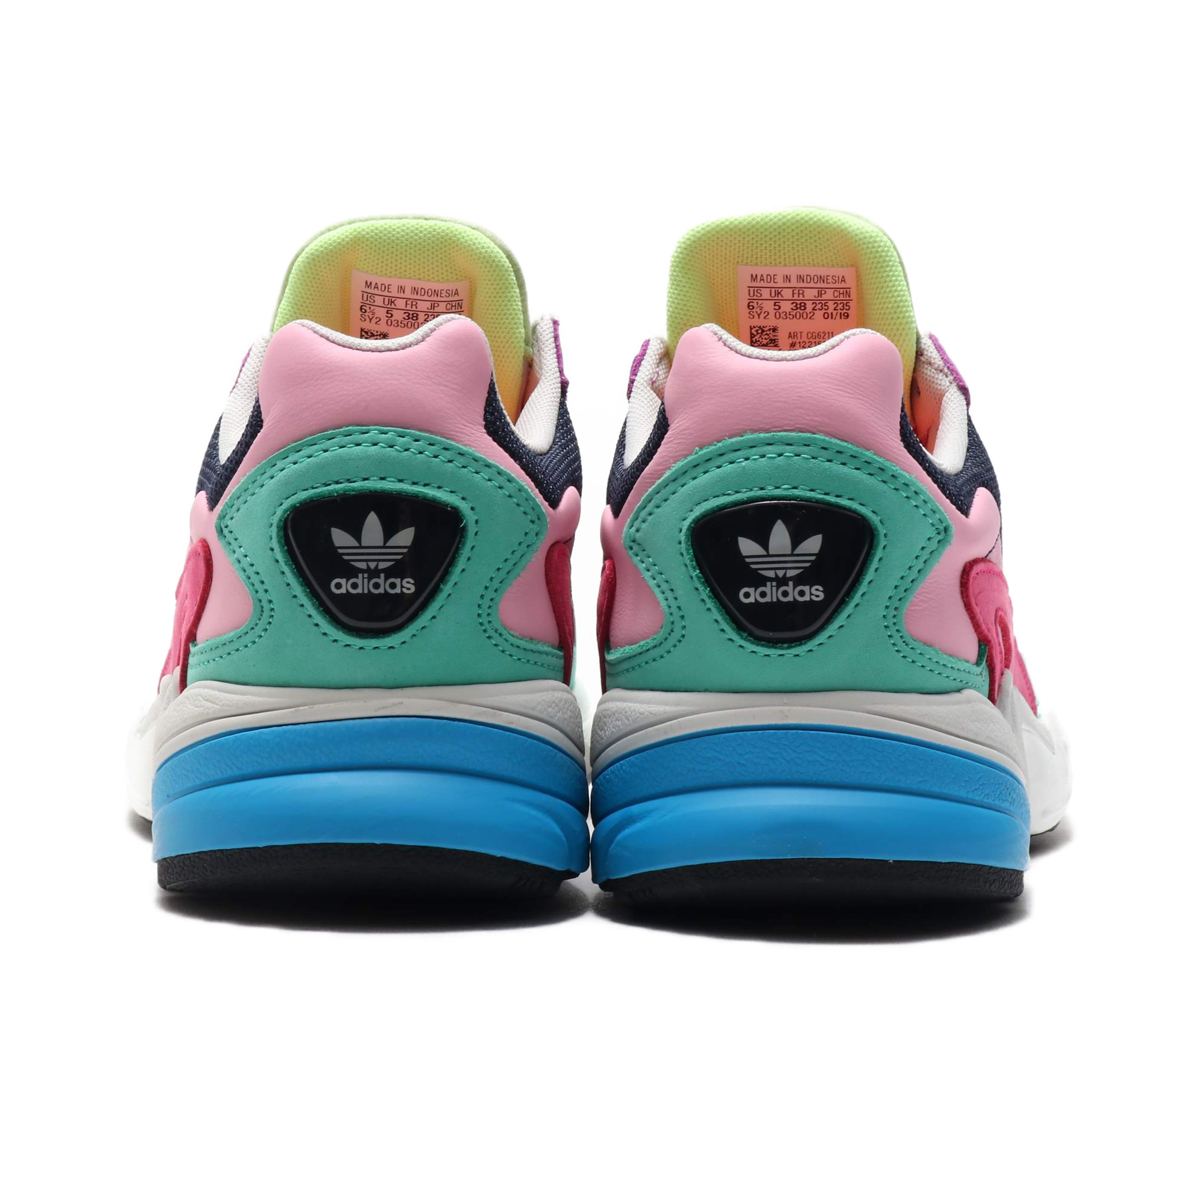 679bc7bb67e7 adidas Originals ADIDASFALCON W (COLLEGIATE NAVY COLLEGIATE NAVY HI-RES  GREEN S18) (Adidas originals Adidas falcon W)